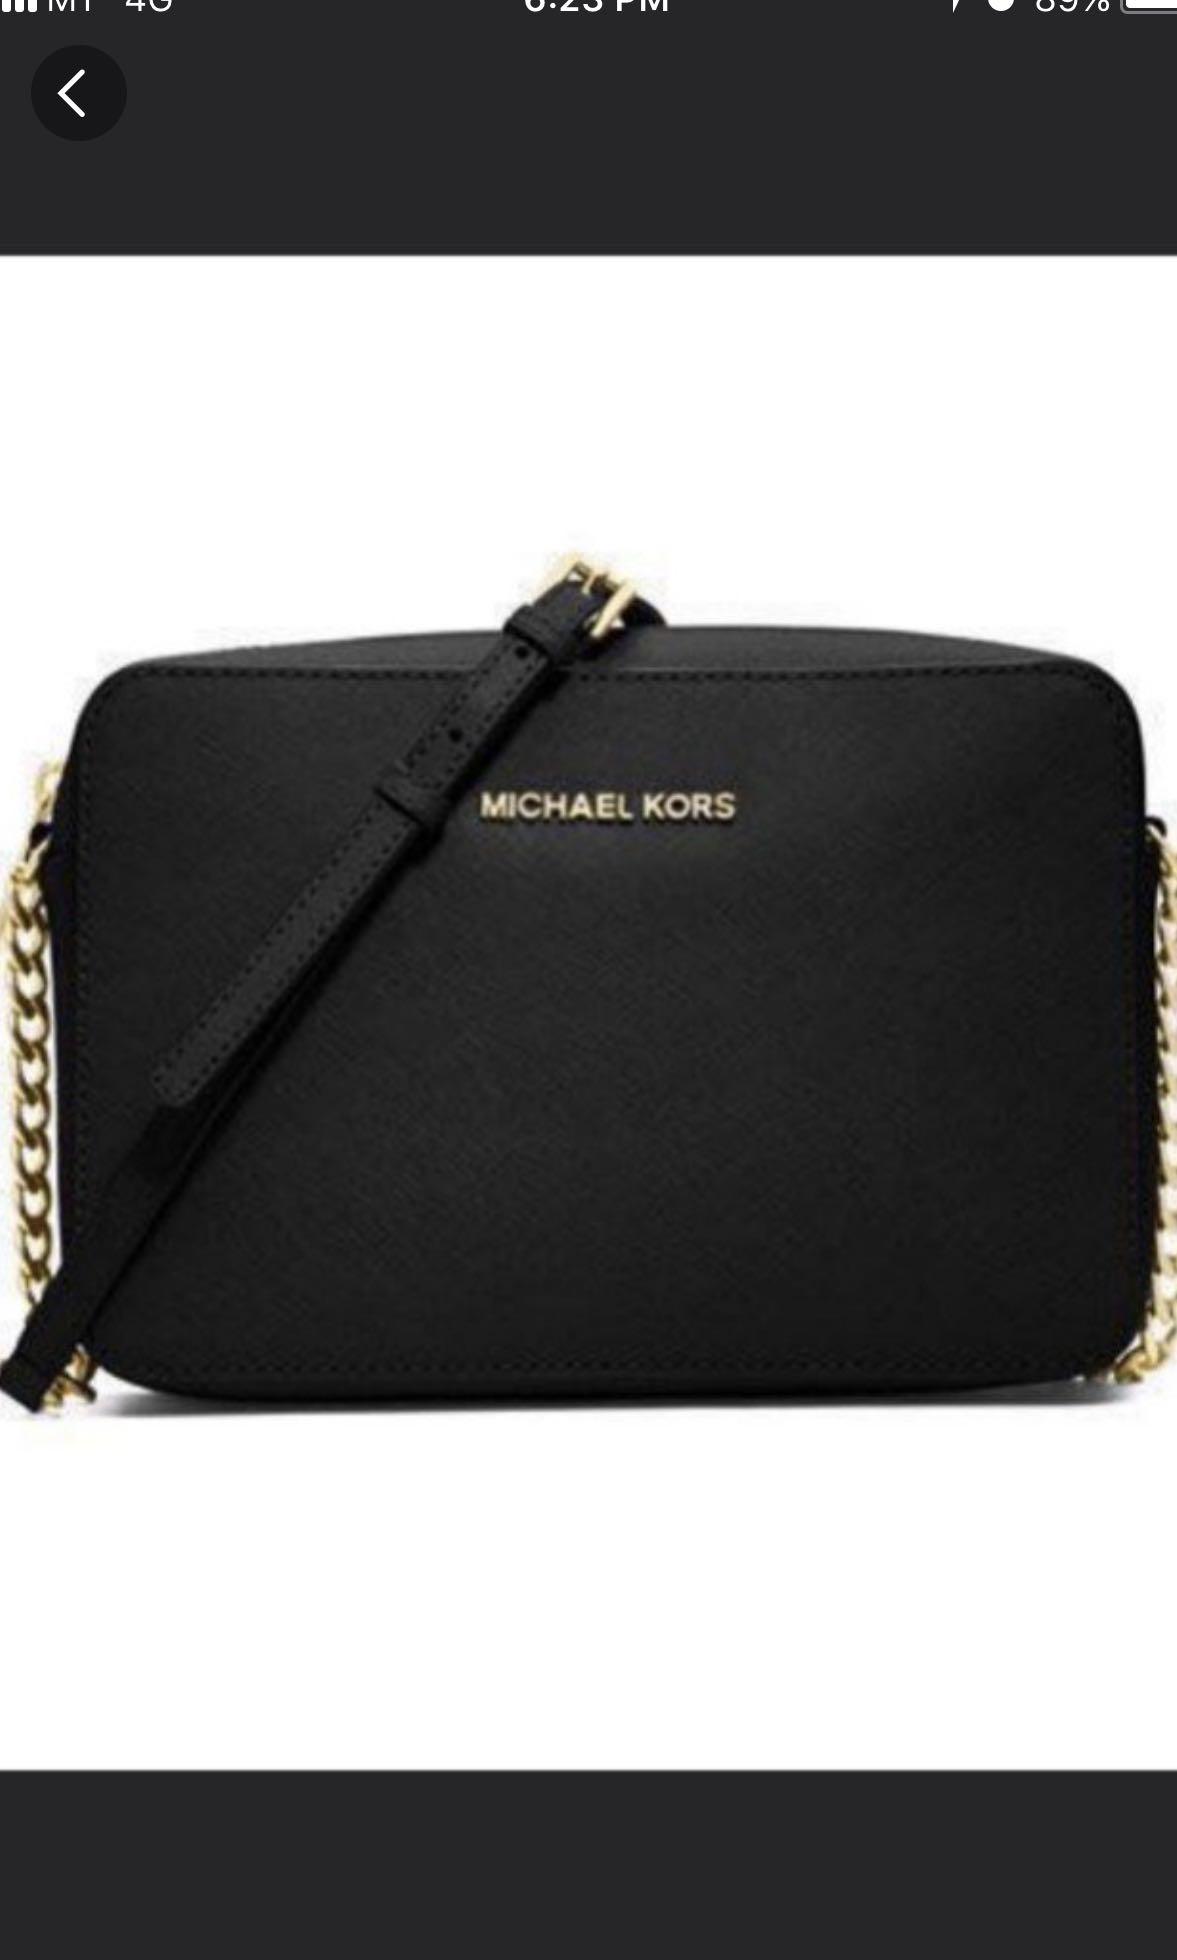 9dd95d1a978f Michael Kors Jetset small sling bag